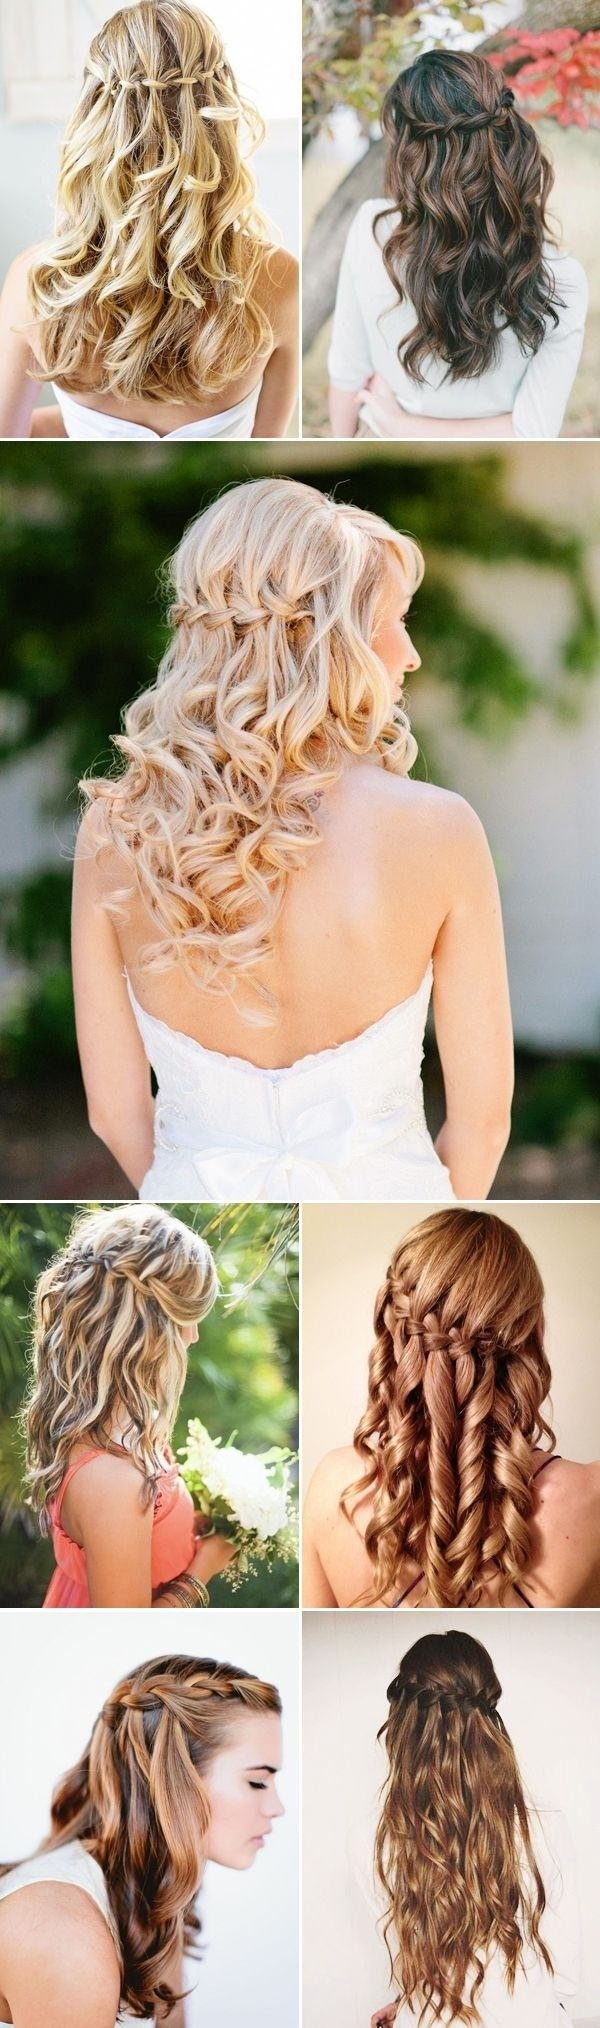 hottest bridesmaid hairstyles for long hair bridesmaid